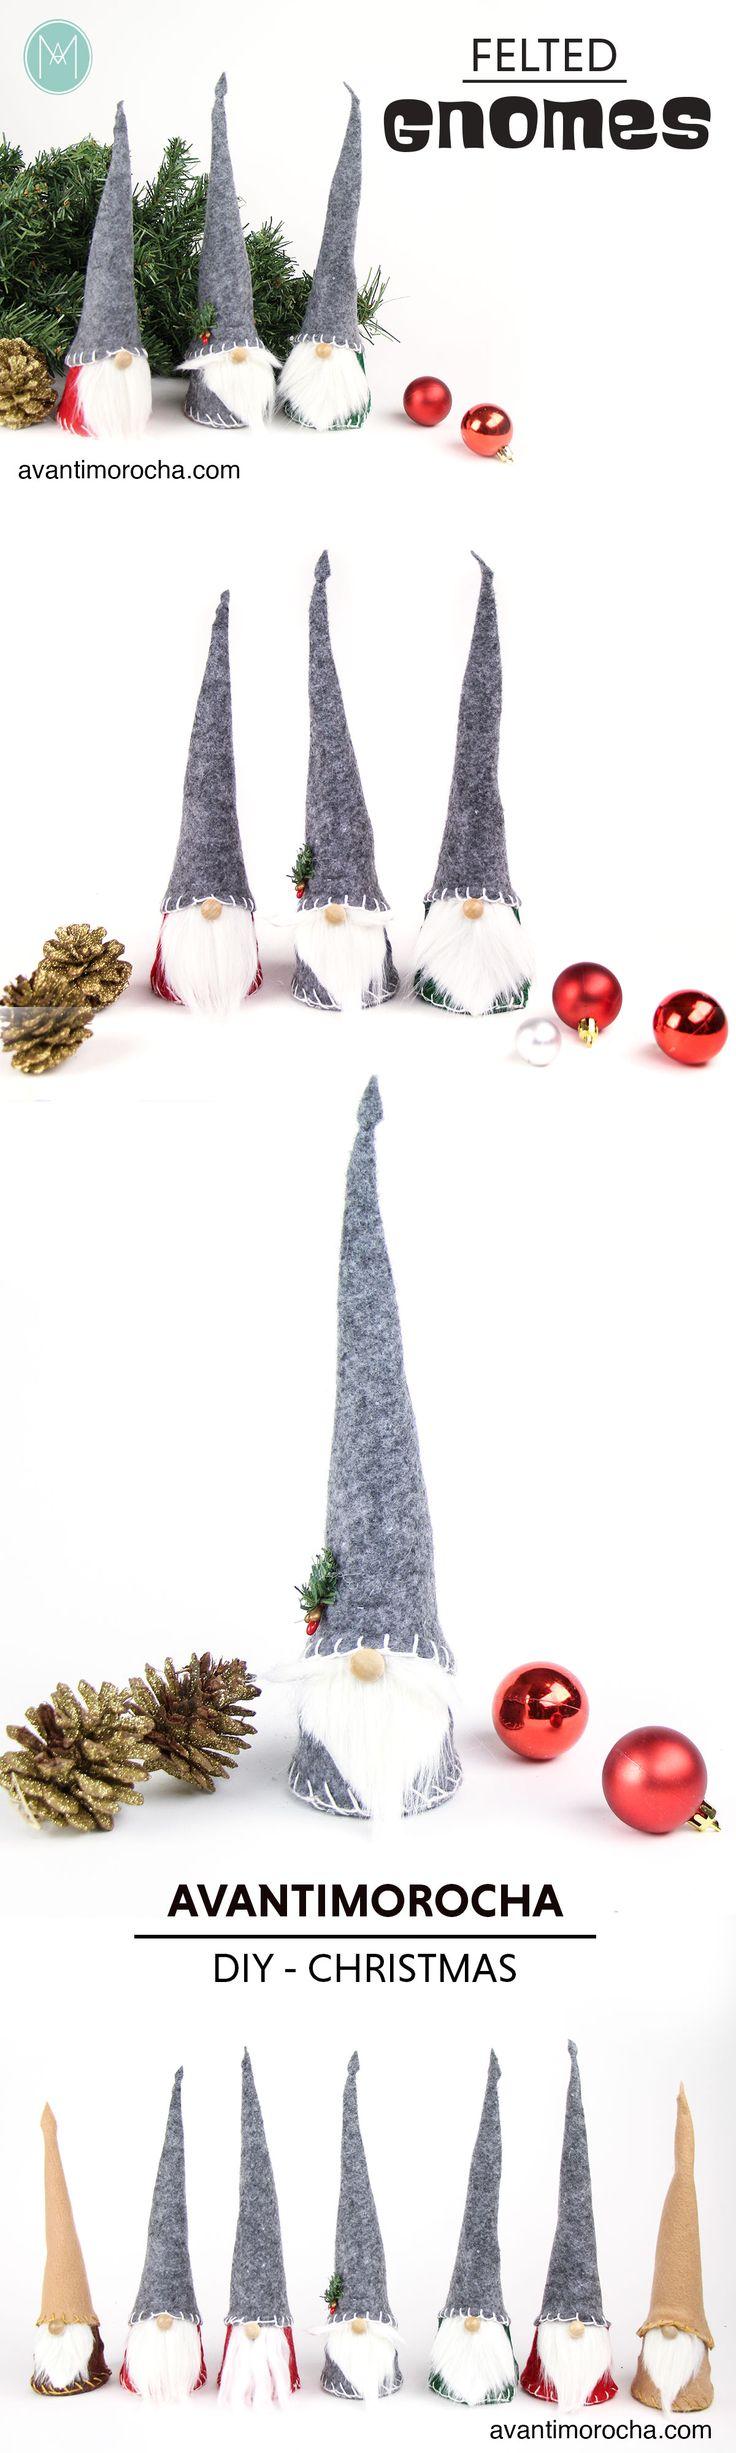 DIY Felted Gnomes | Christmas | Decorations | Ornament | Navidad